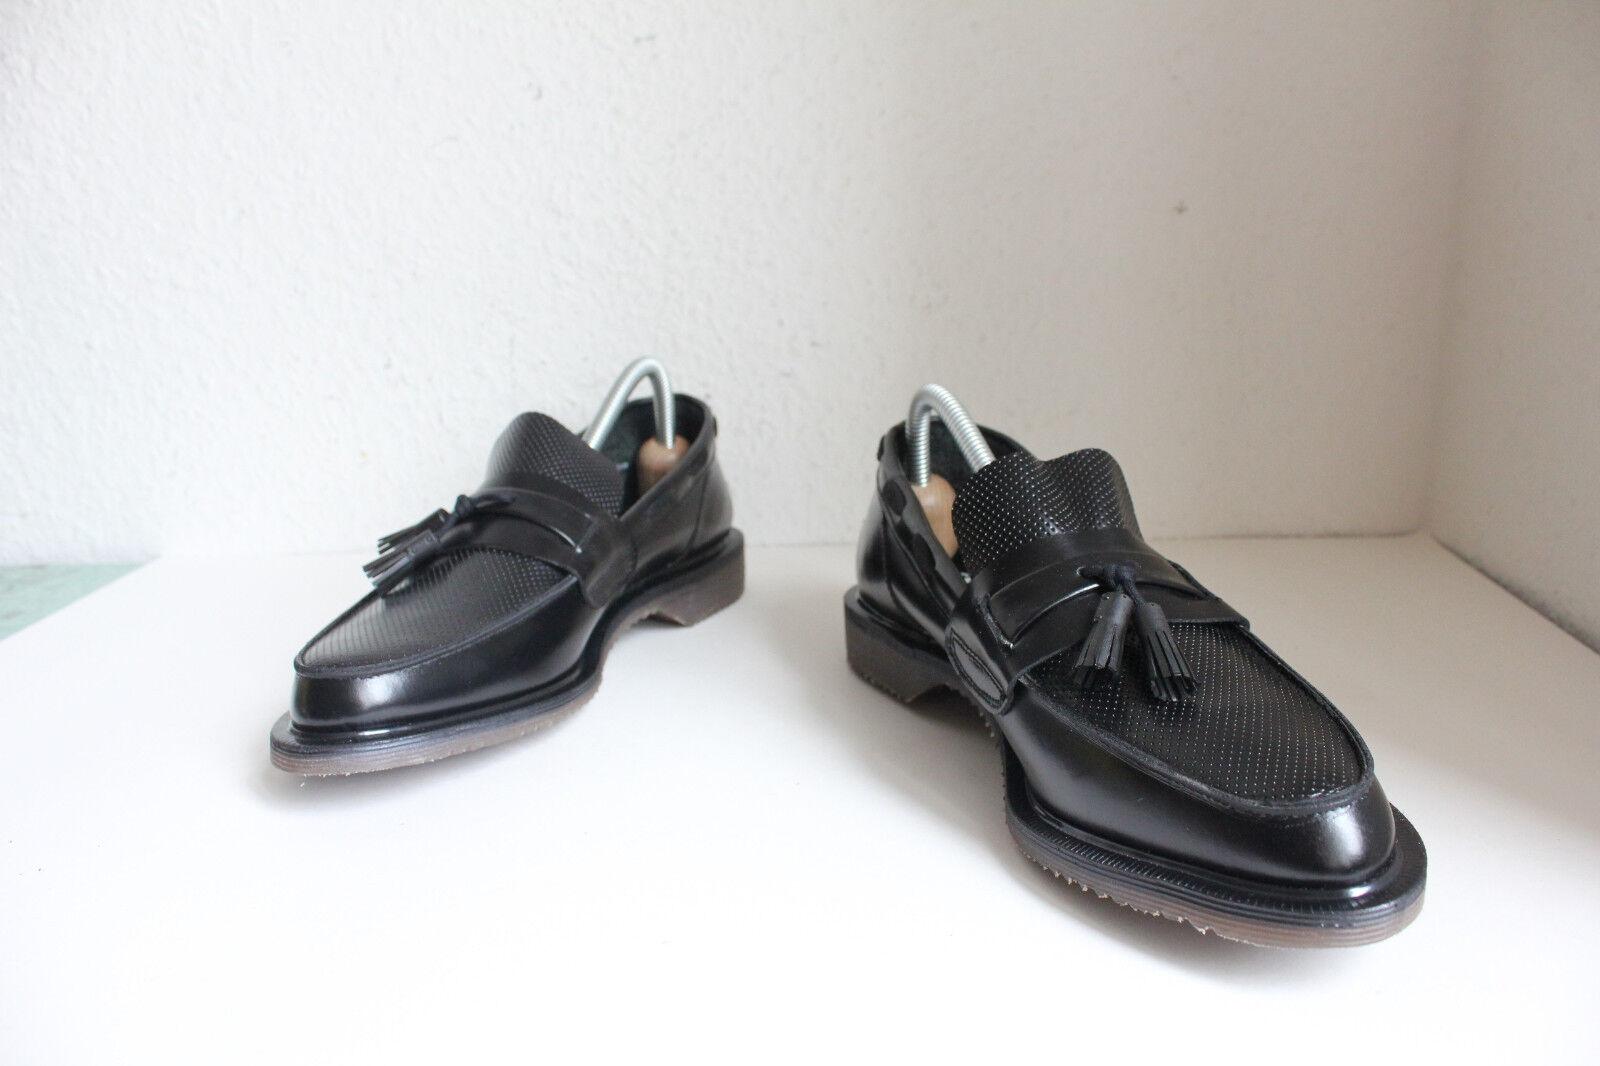 Vintage Dr. Martens Schuhe Mokassin Schwarz Eu 40,5-Uk 7 made in England-Neu